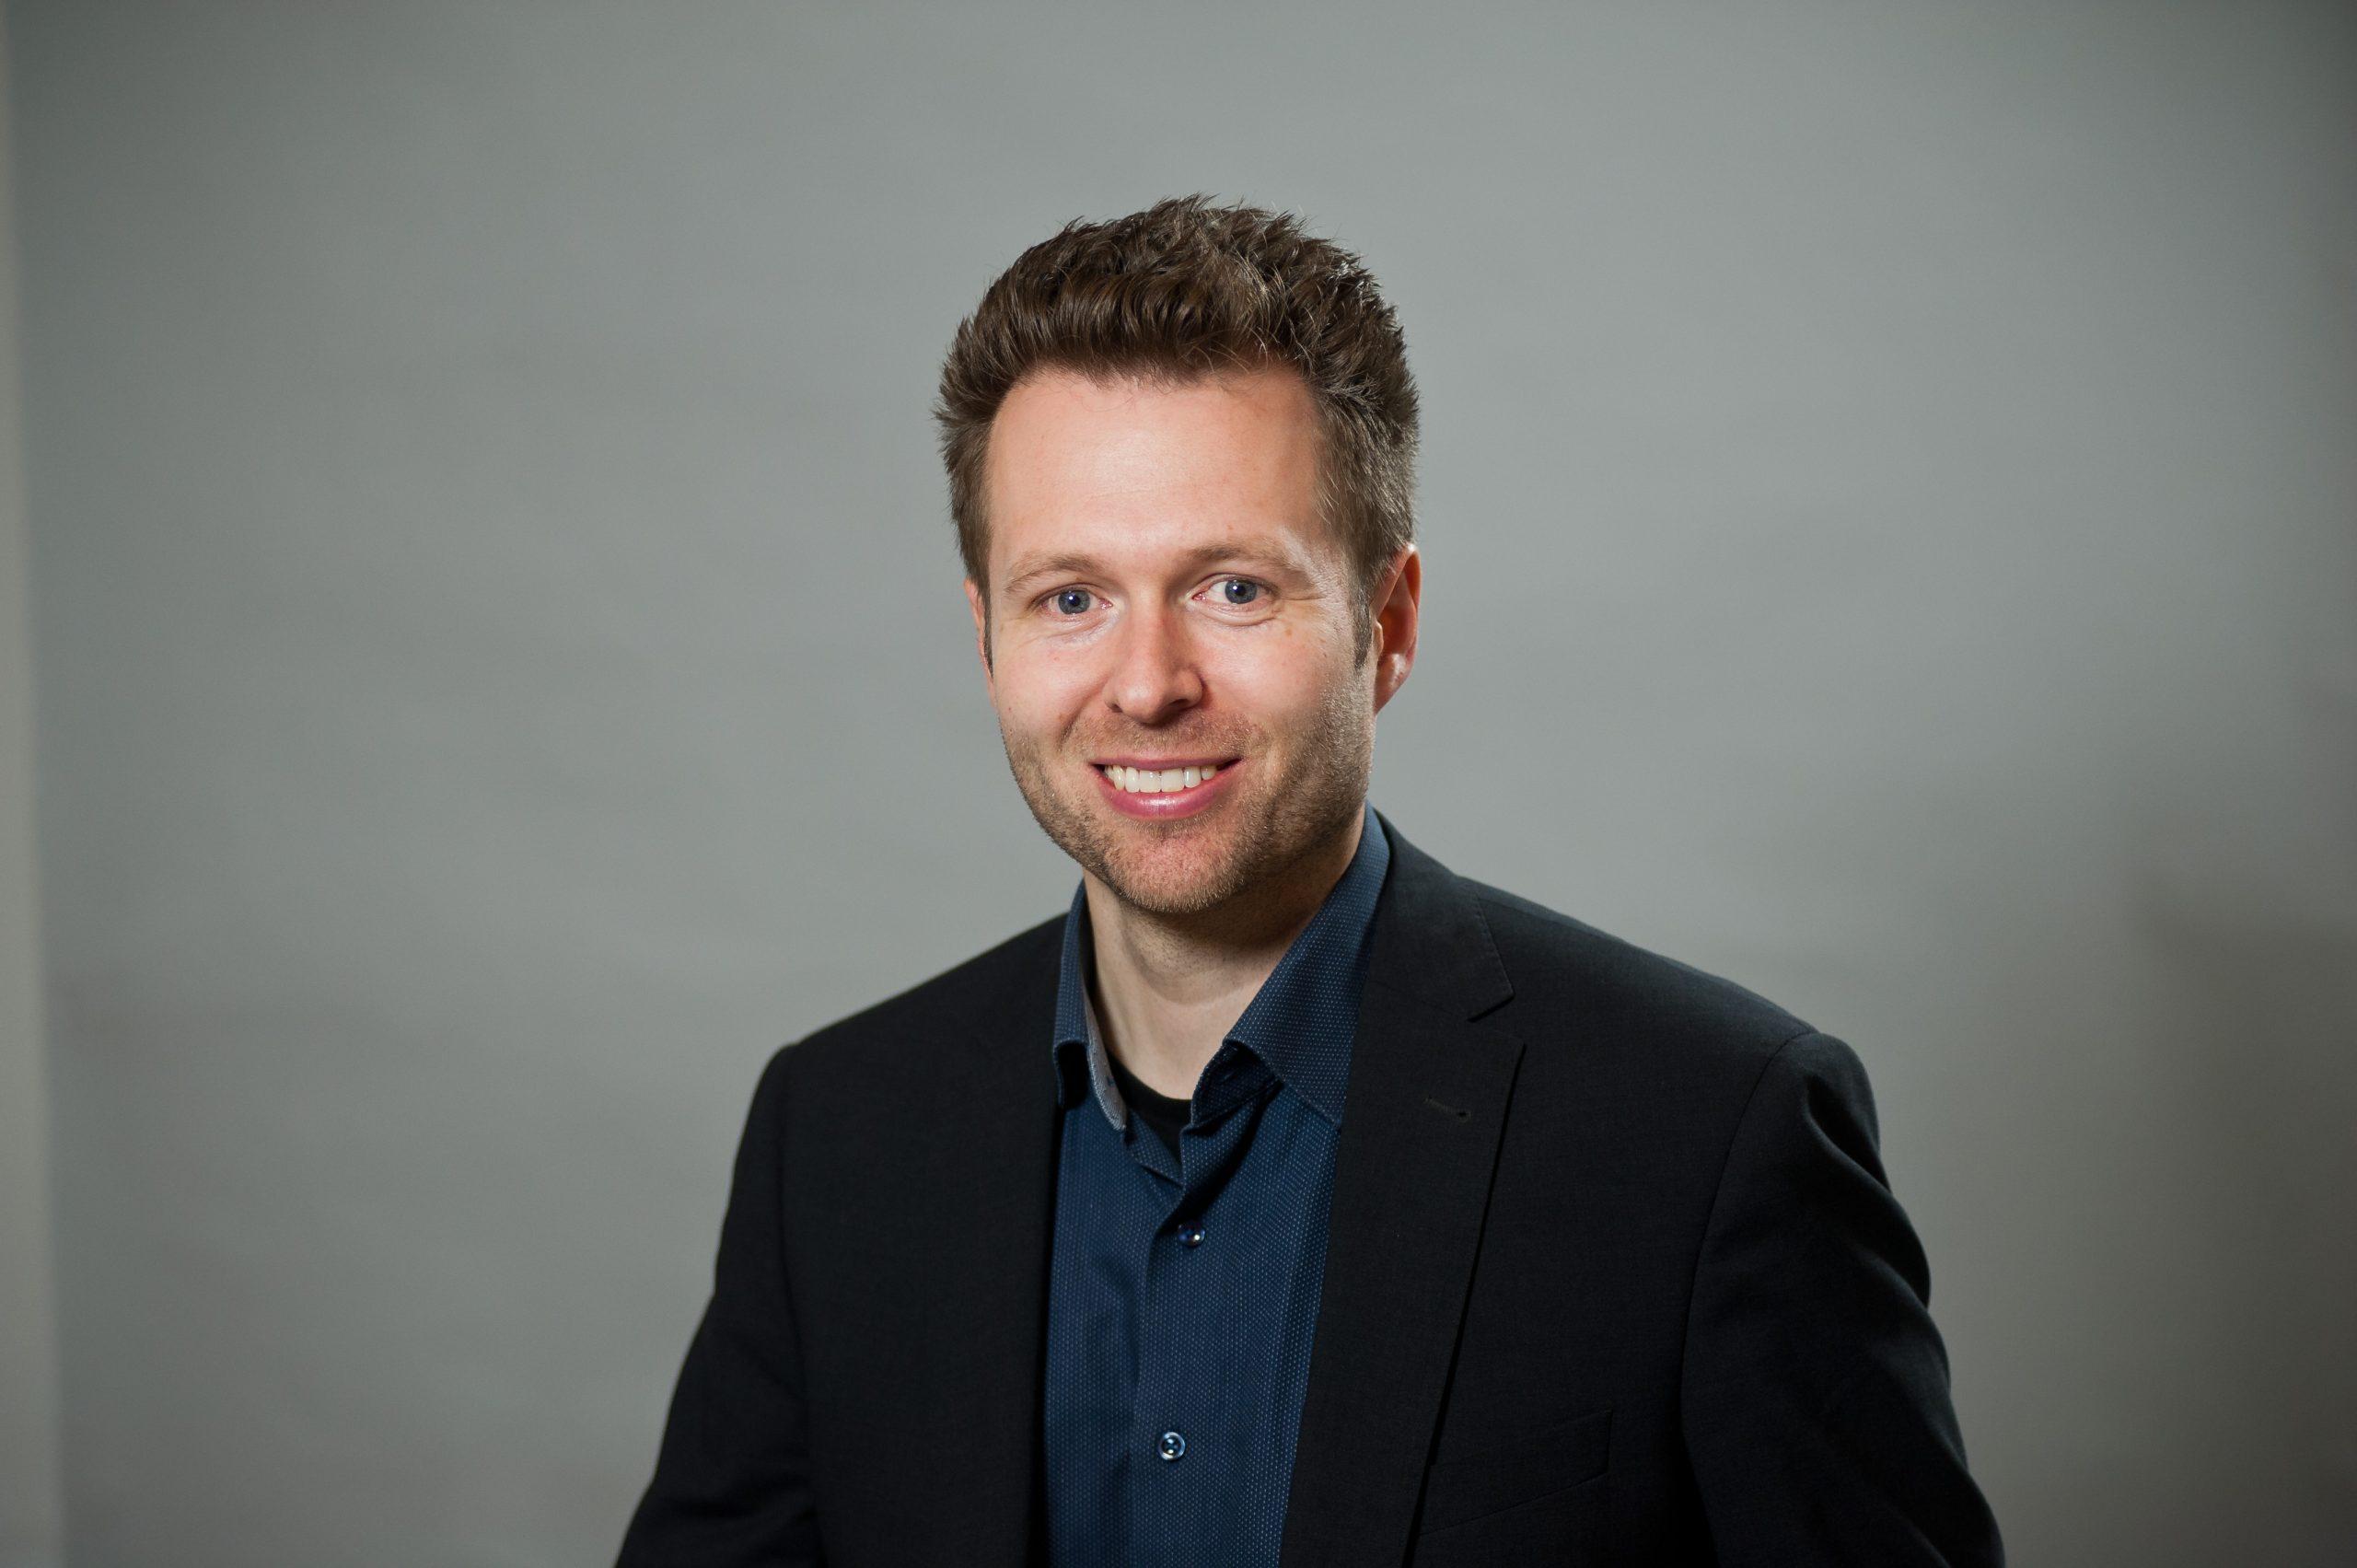 Benjamin Tietjen